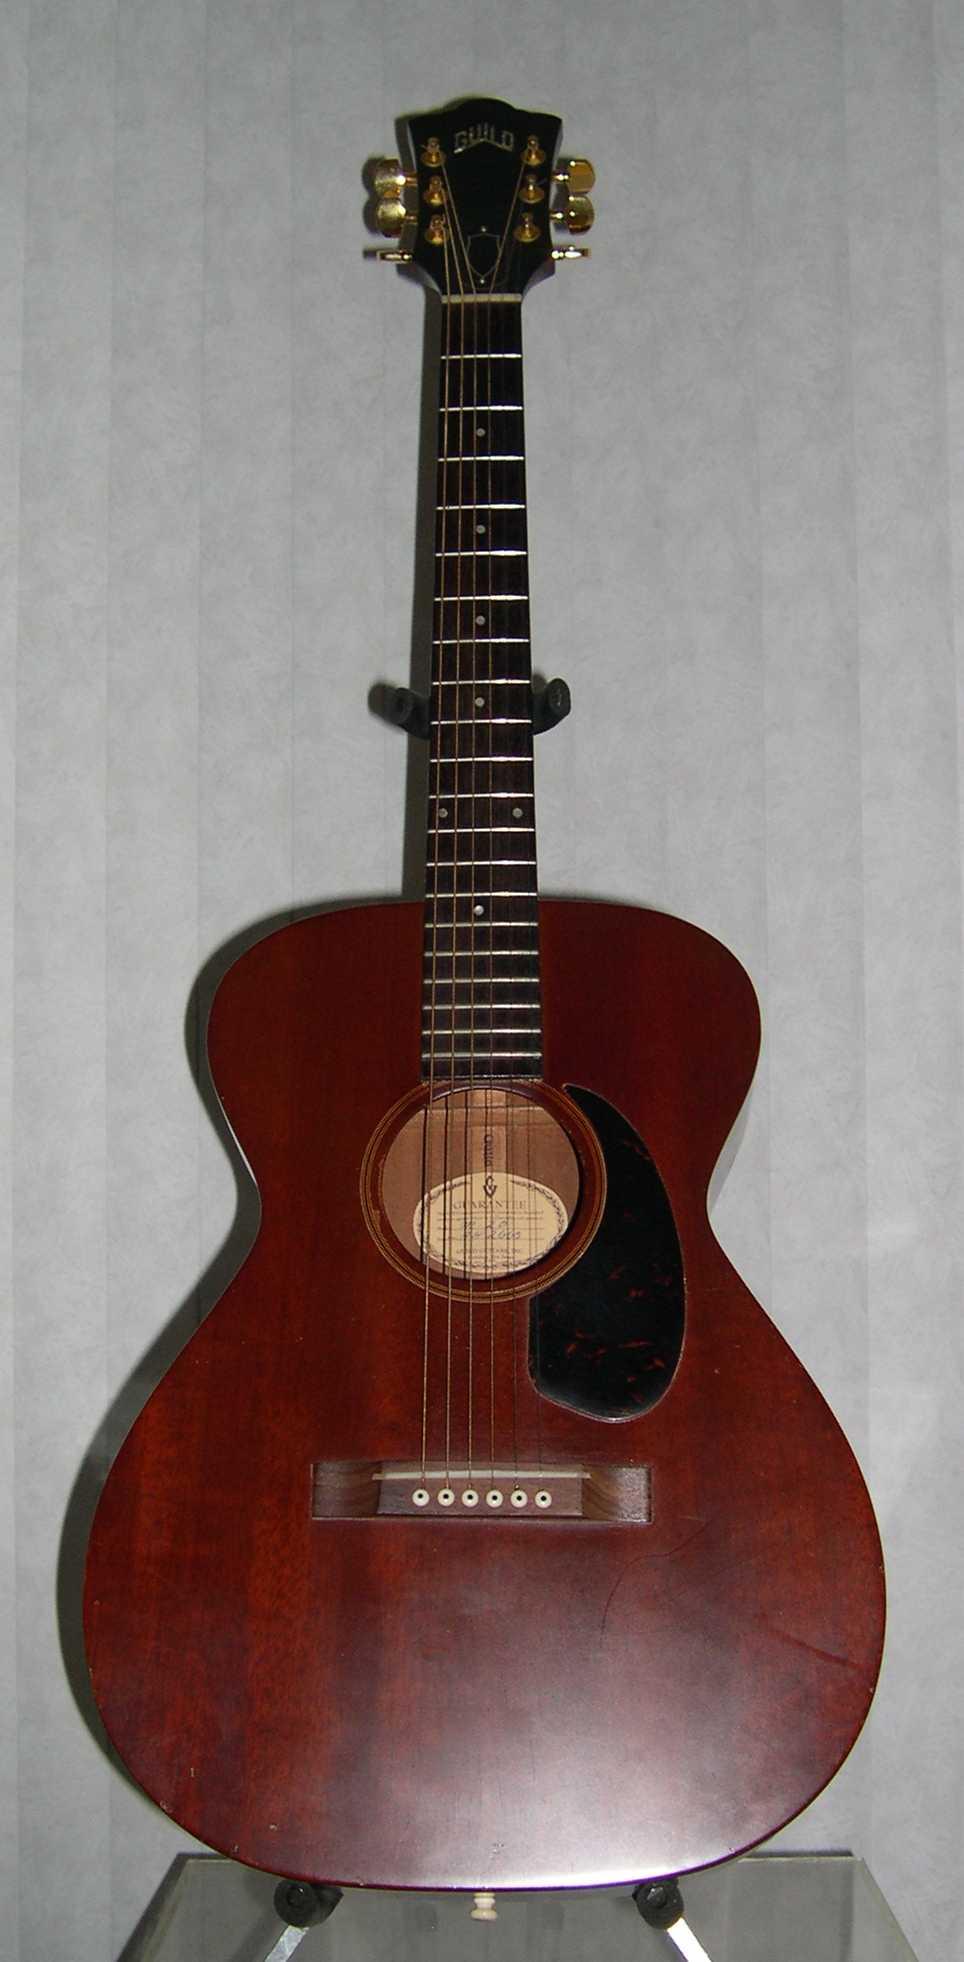 bozo 39 s guild guitar page 1965 guild m 20. Black Bedroom Furniture Sets. Home Design Ideas